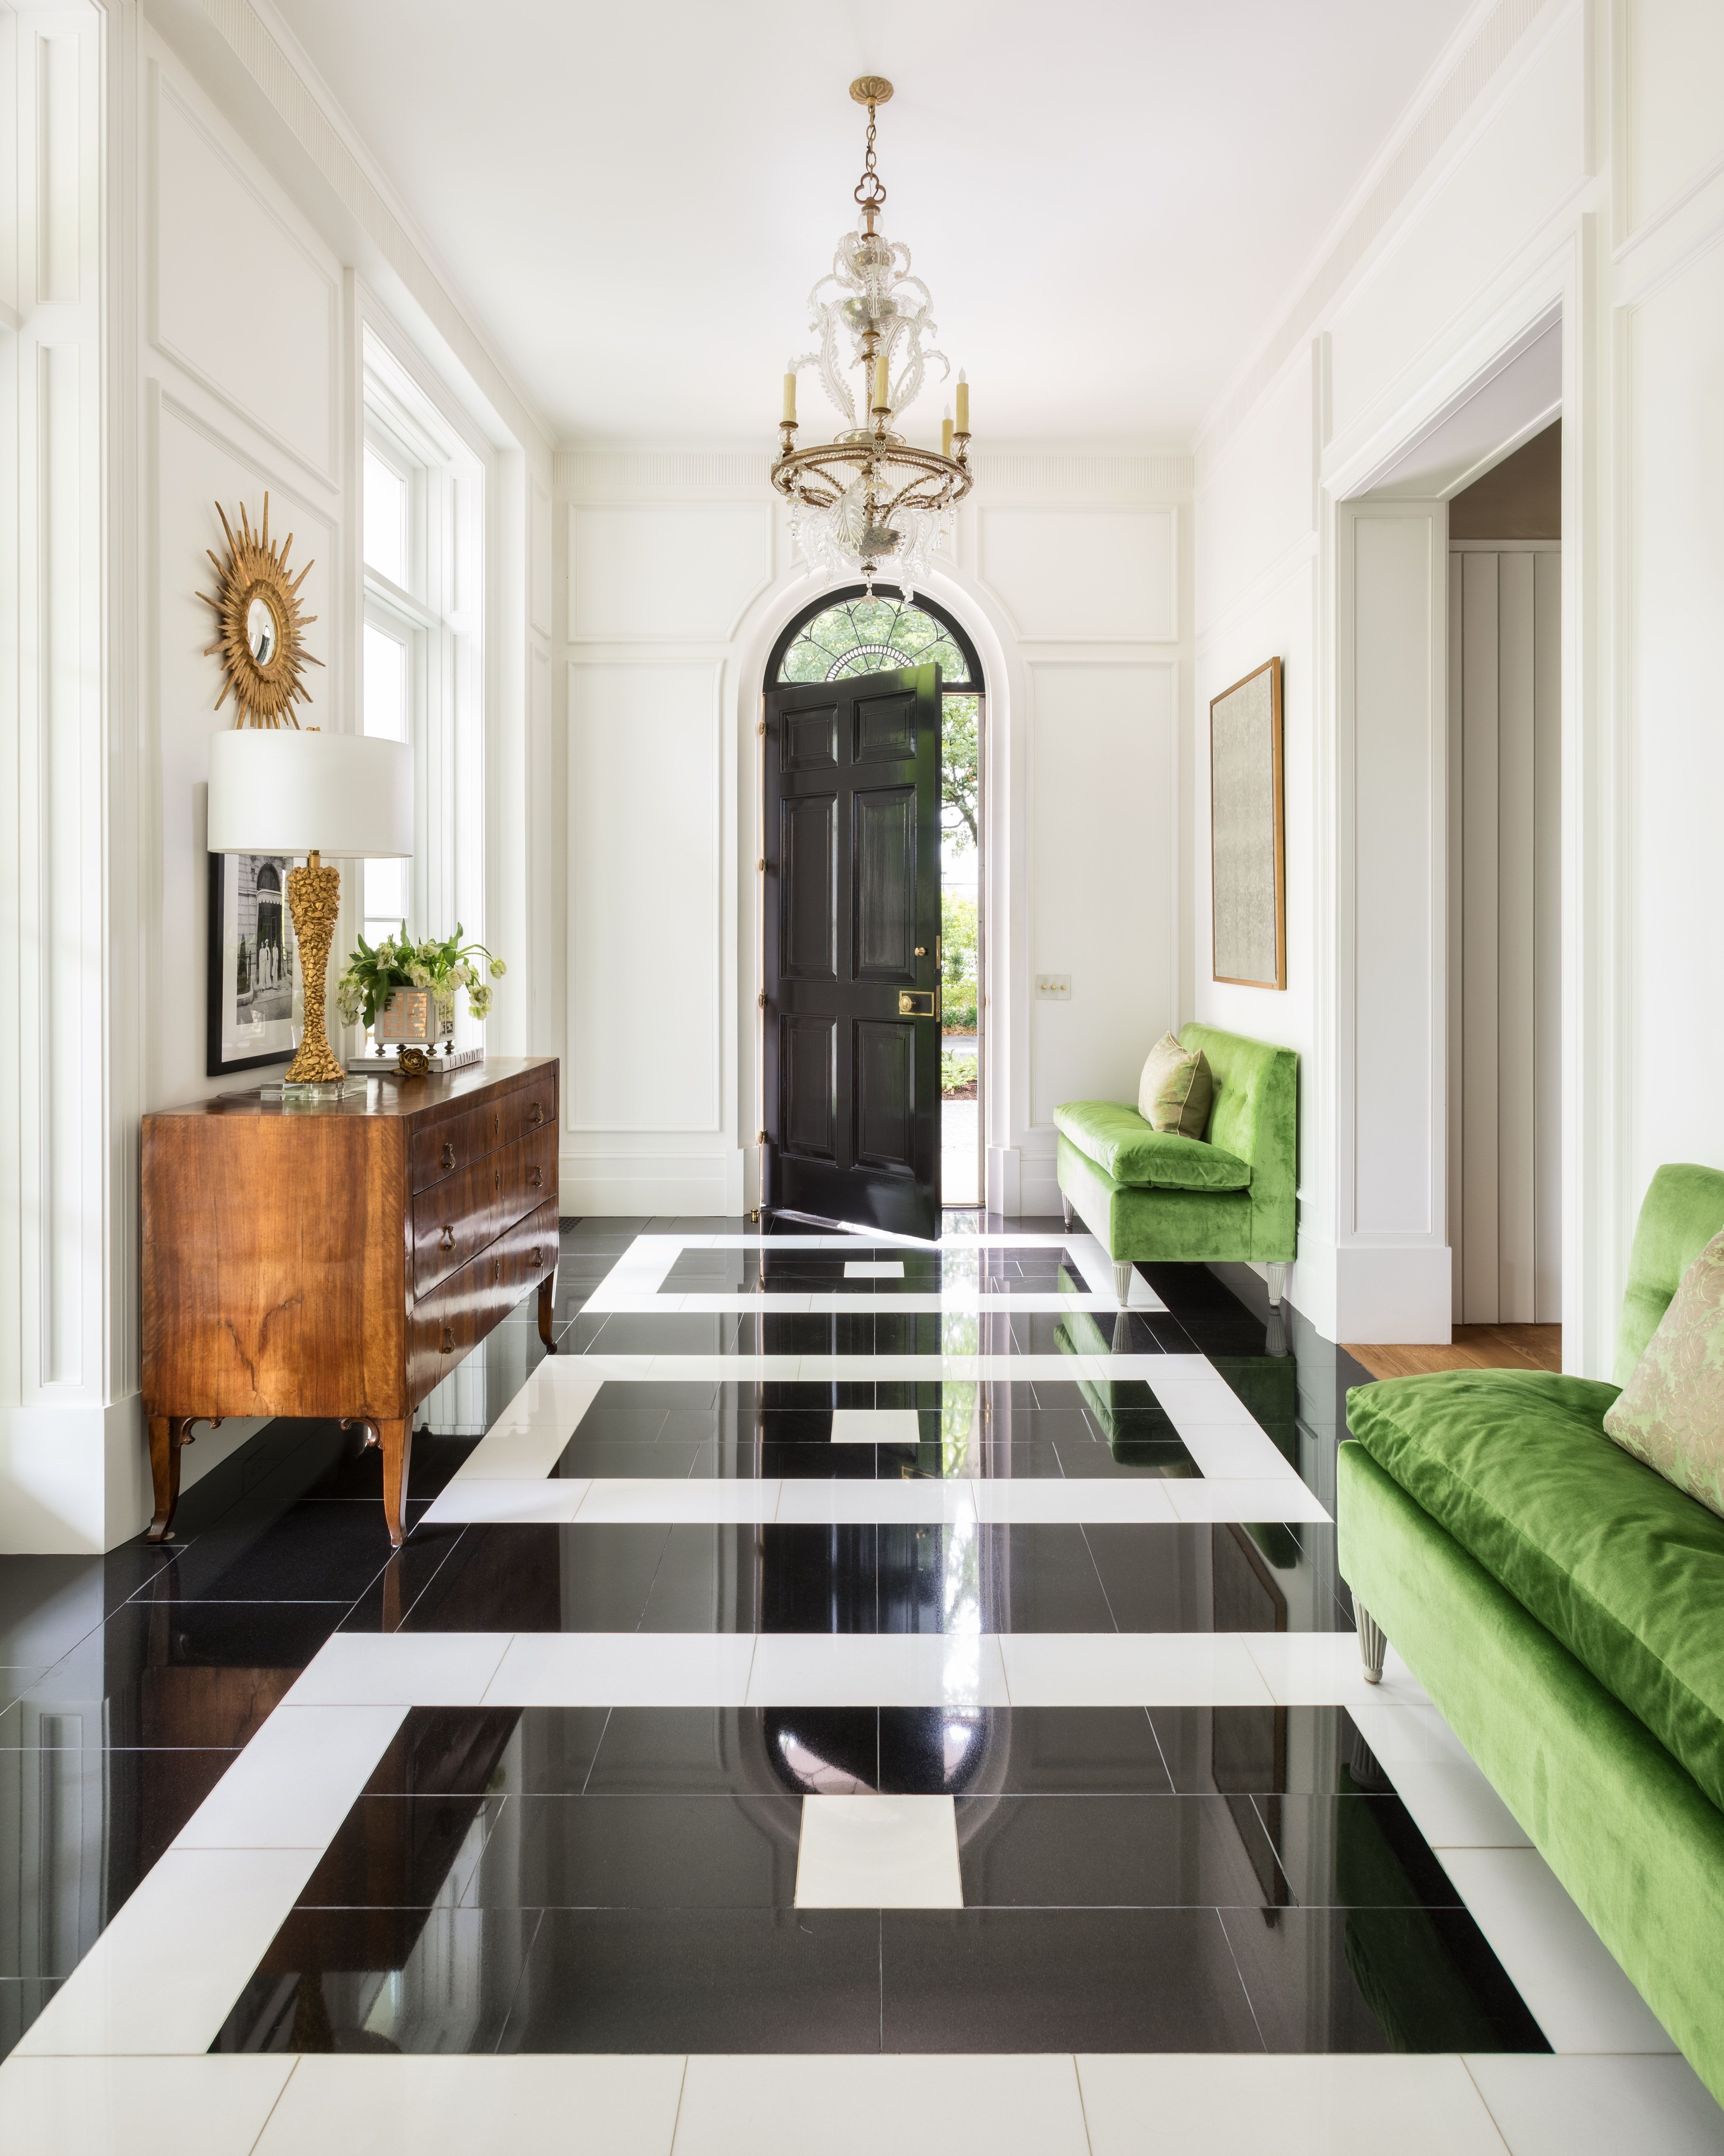 Suzanne Kasler Interiors   Interior Designer In Atlanta, GA, 30305